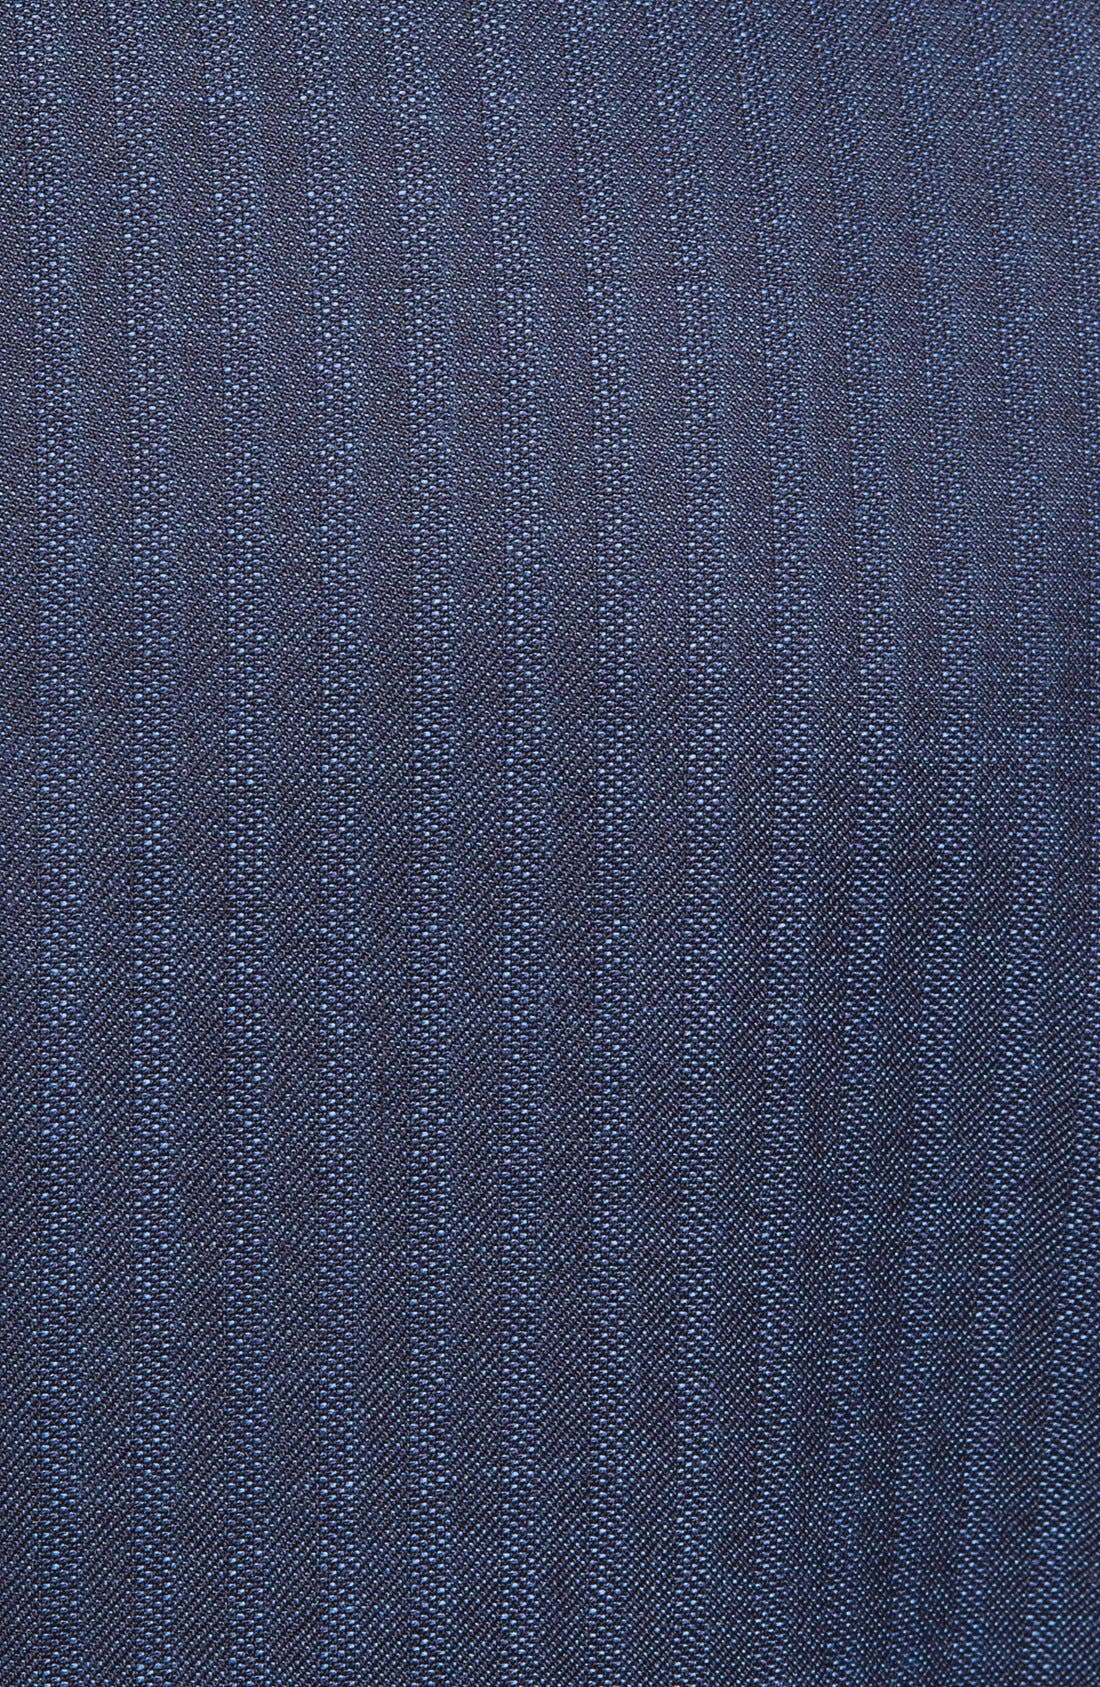 Alternate Image 2  - Paul Smith London Slim Fit Stripe Wool Suit